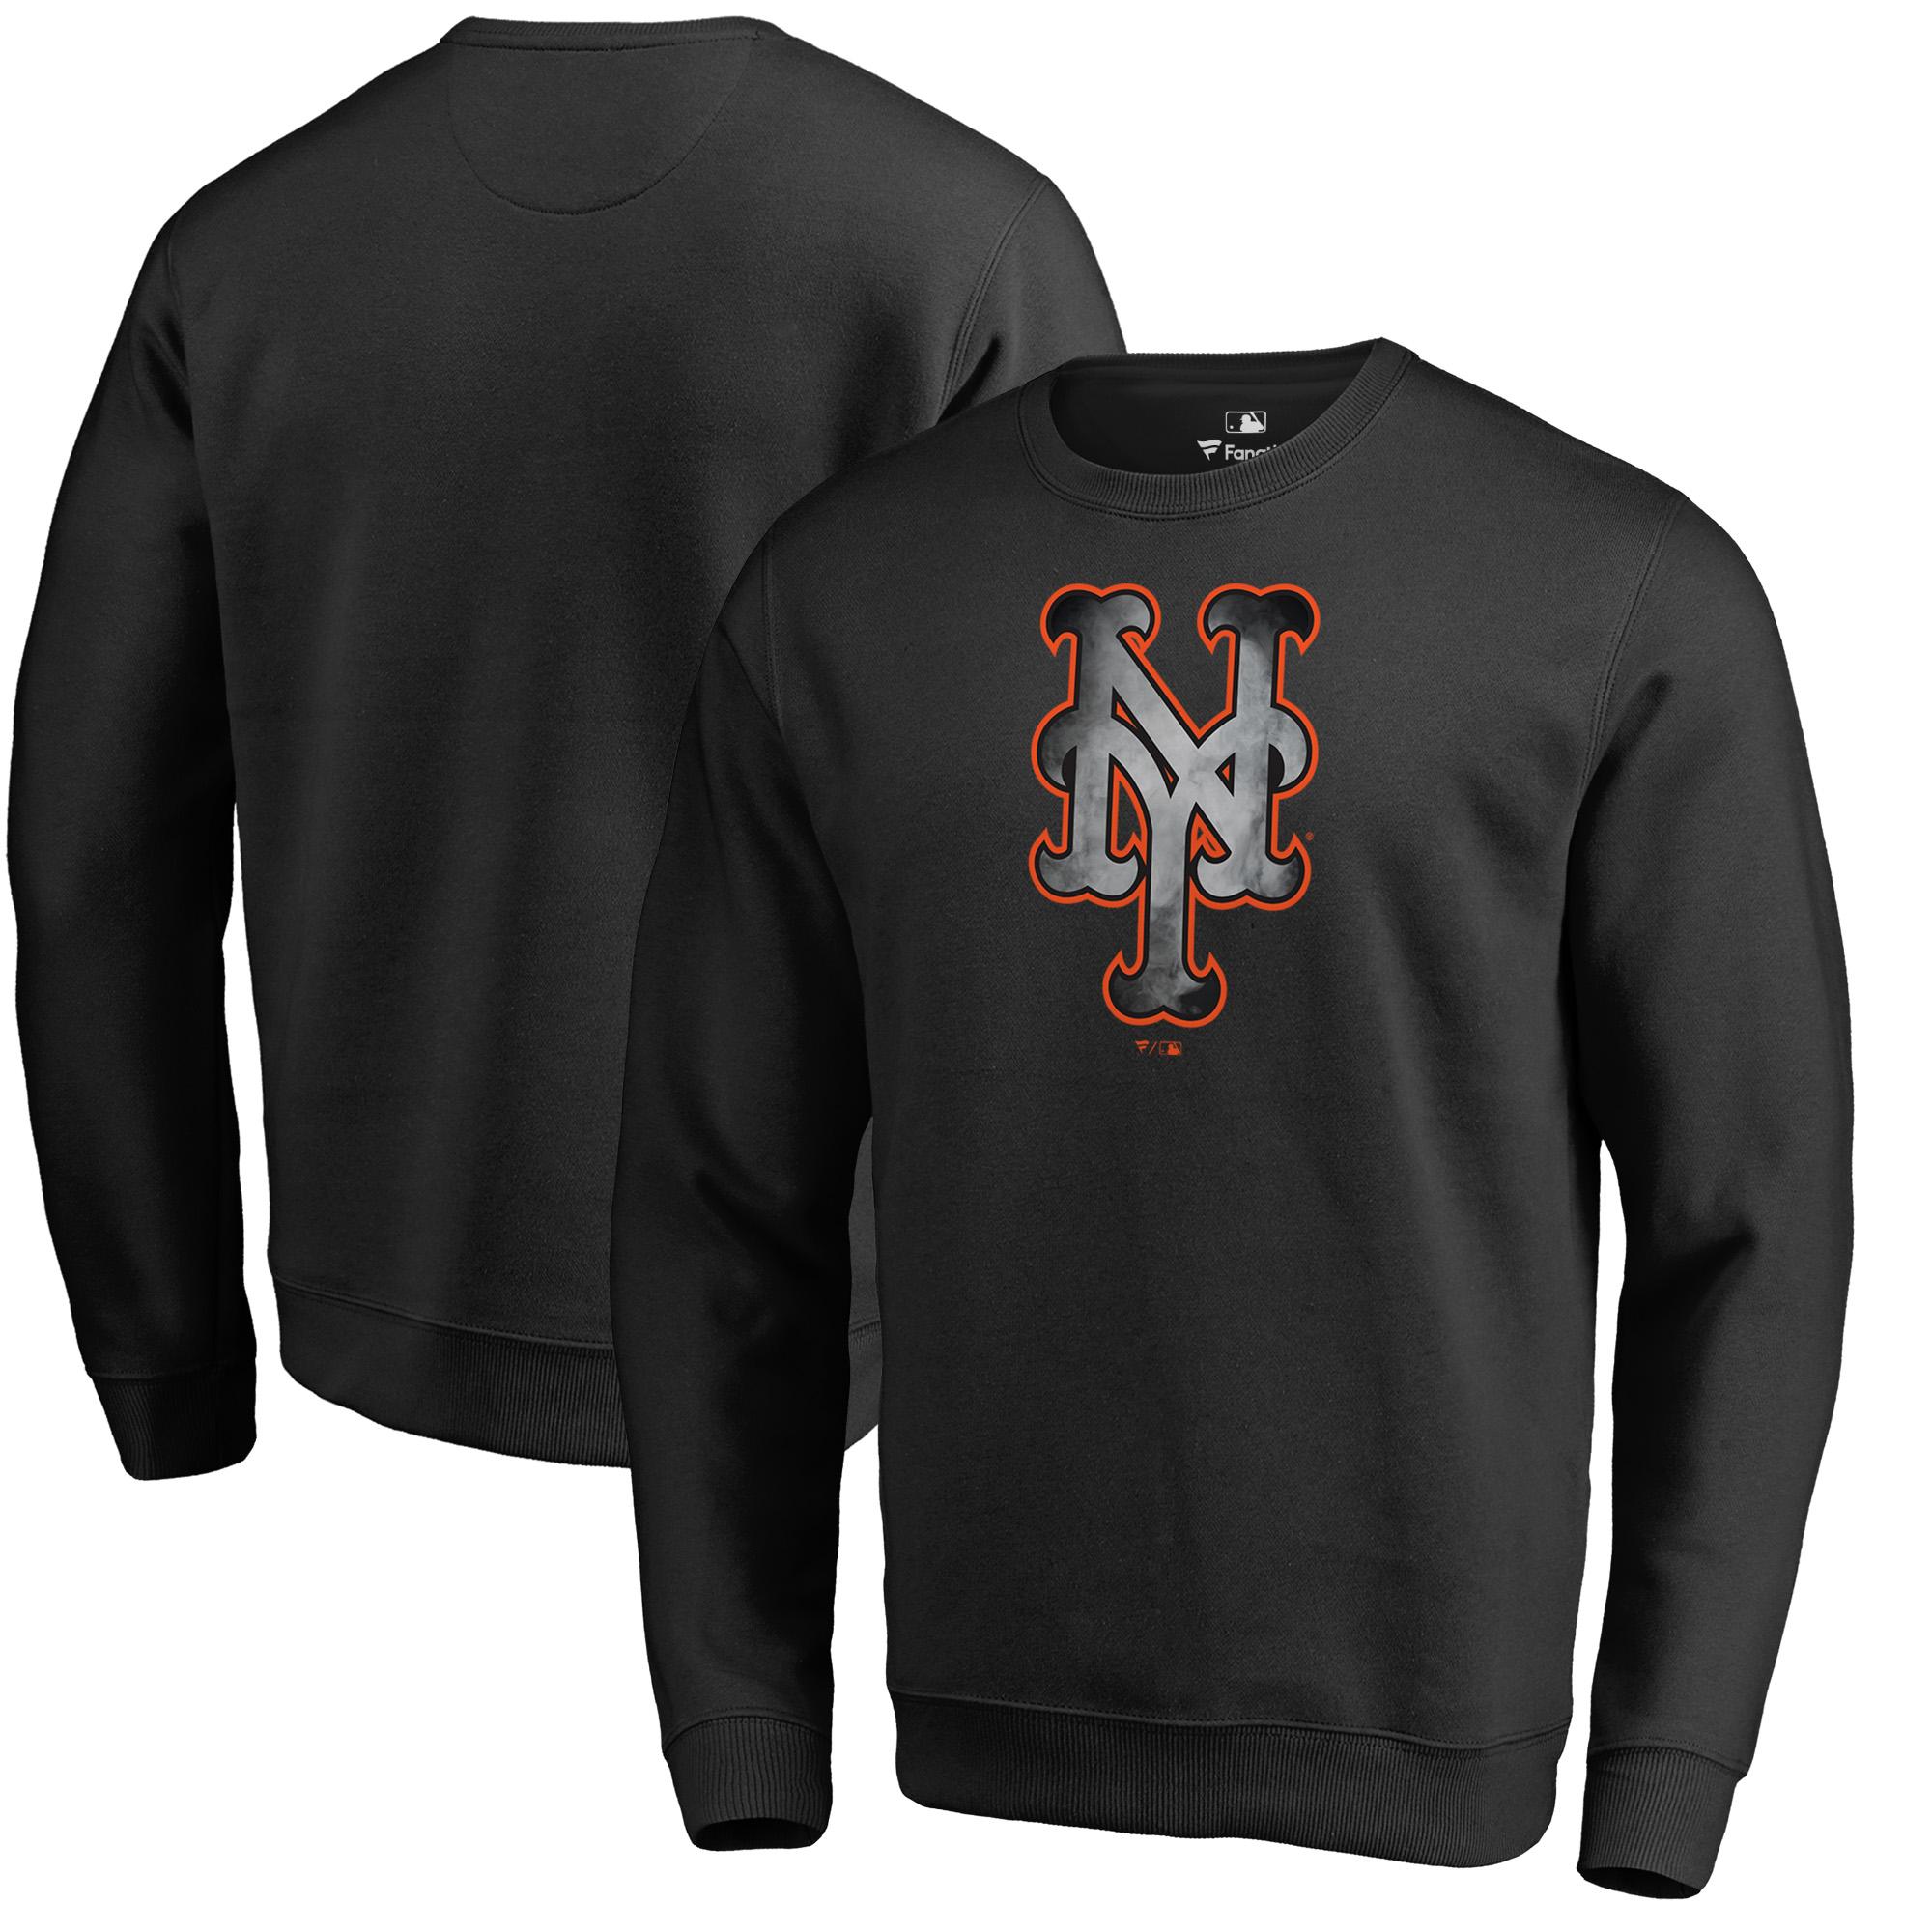 New York Mets Fanatics Branded Core Smoke Fleece Sweatshirt - Black